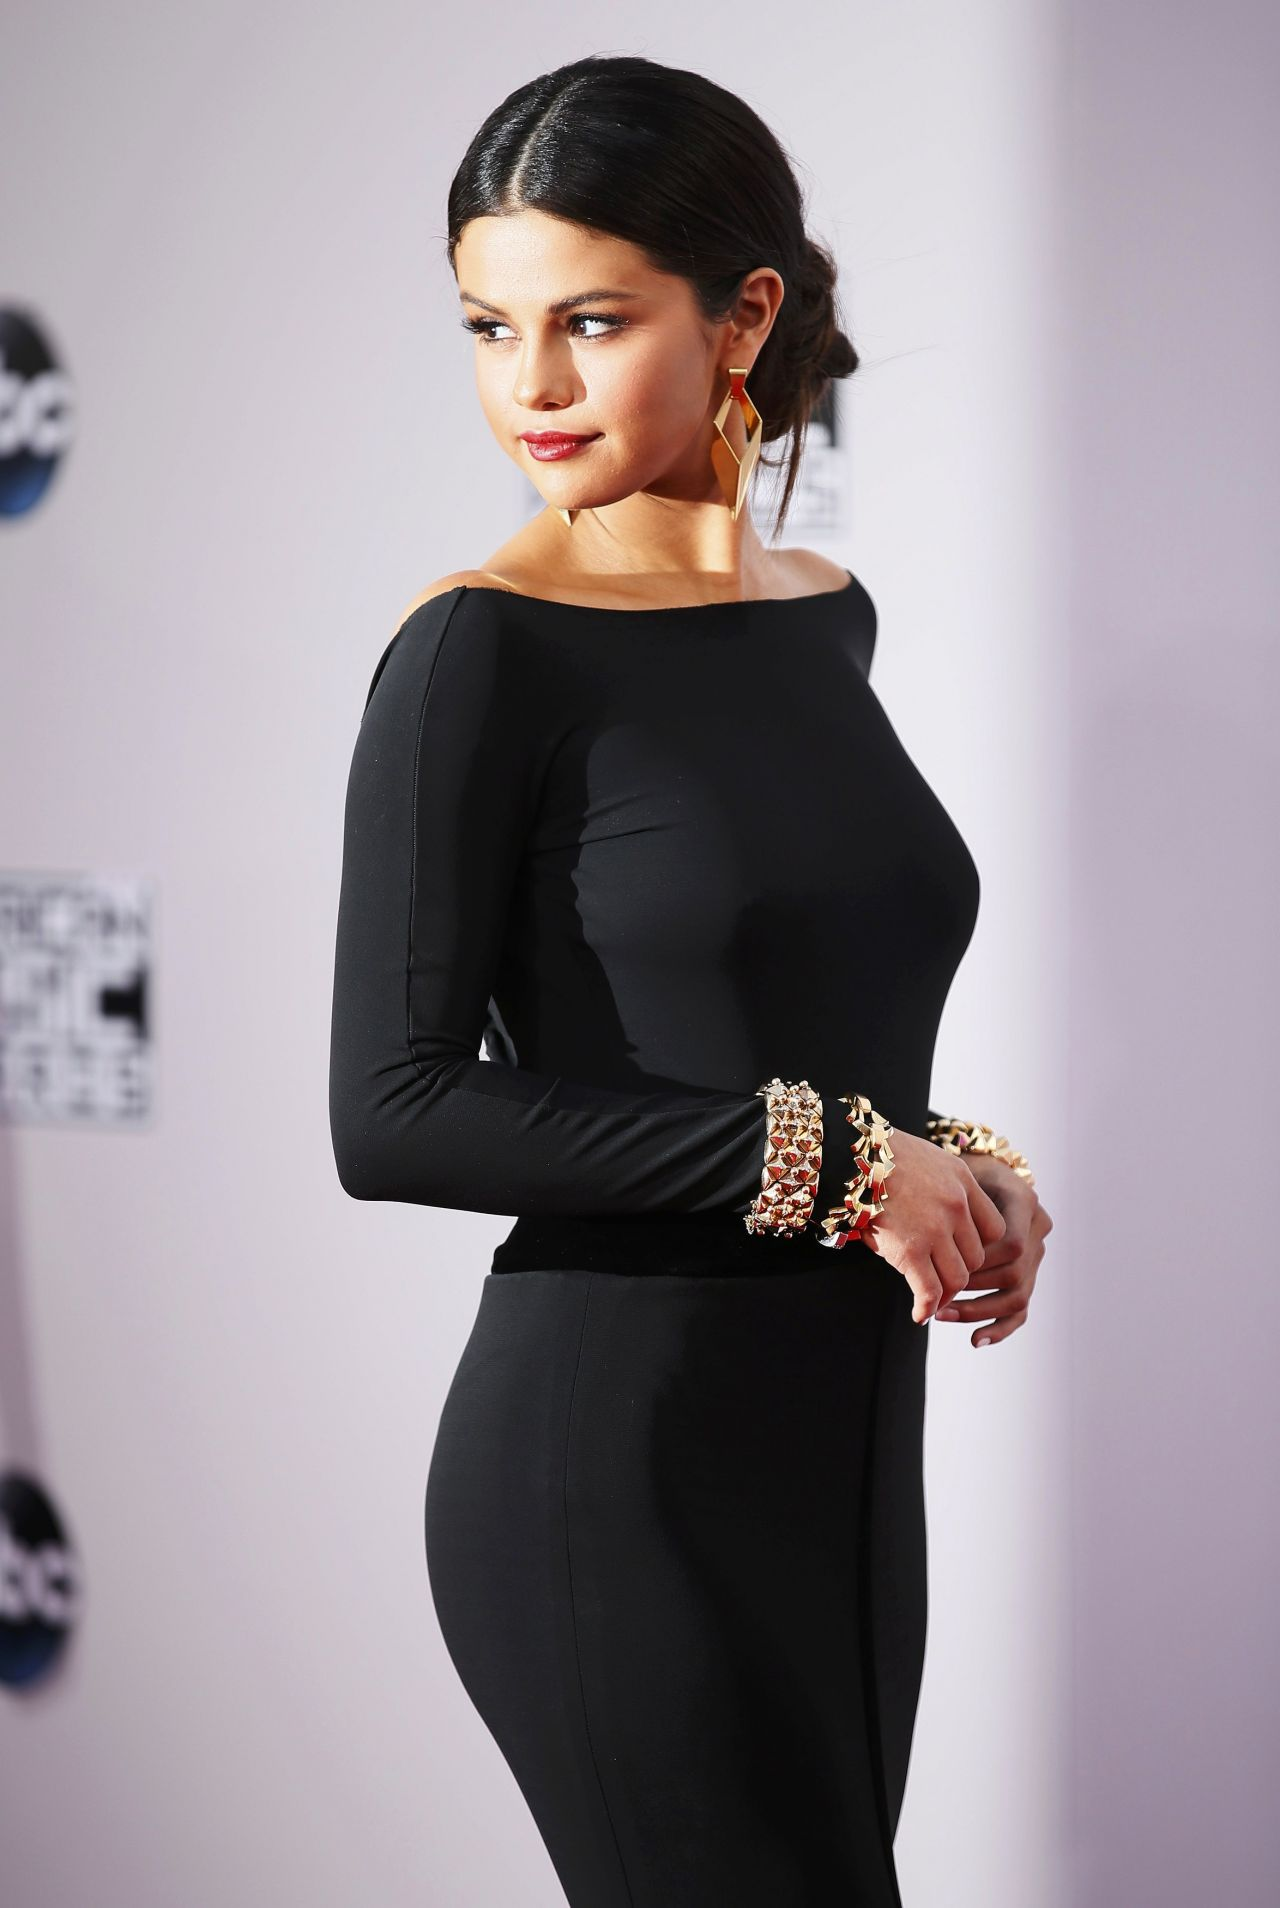 Selena gomez red carpet photos 2014 american music awards - Photo selena gomez 2014 ...